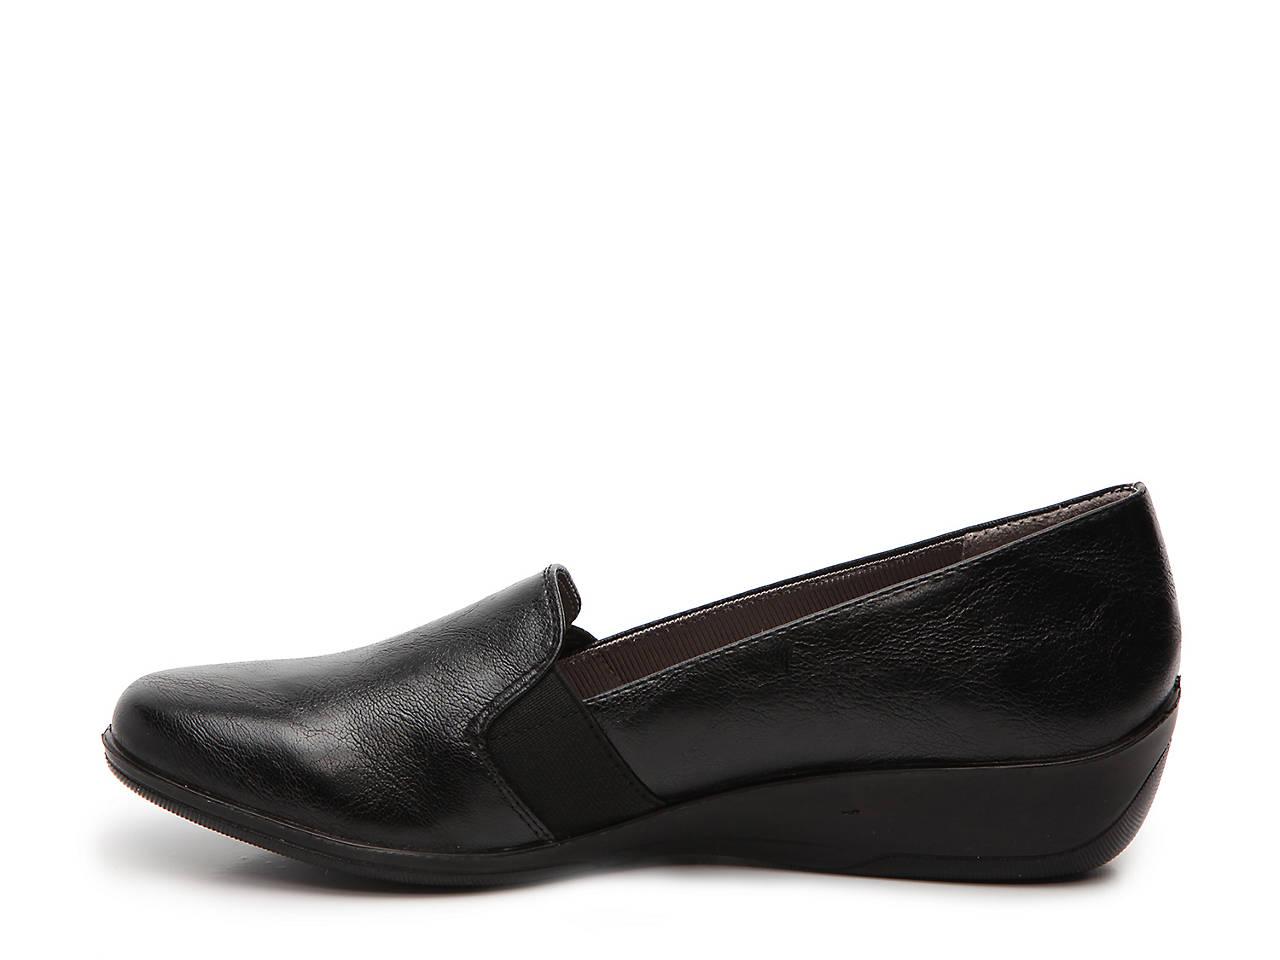 4d90296147f LifeStride Isabelle Wedge Slip-On Women s Shoes